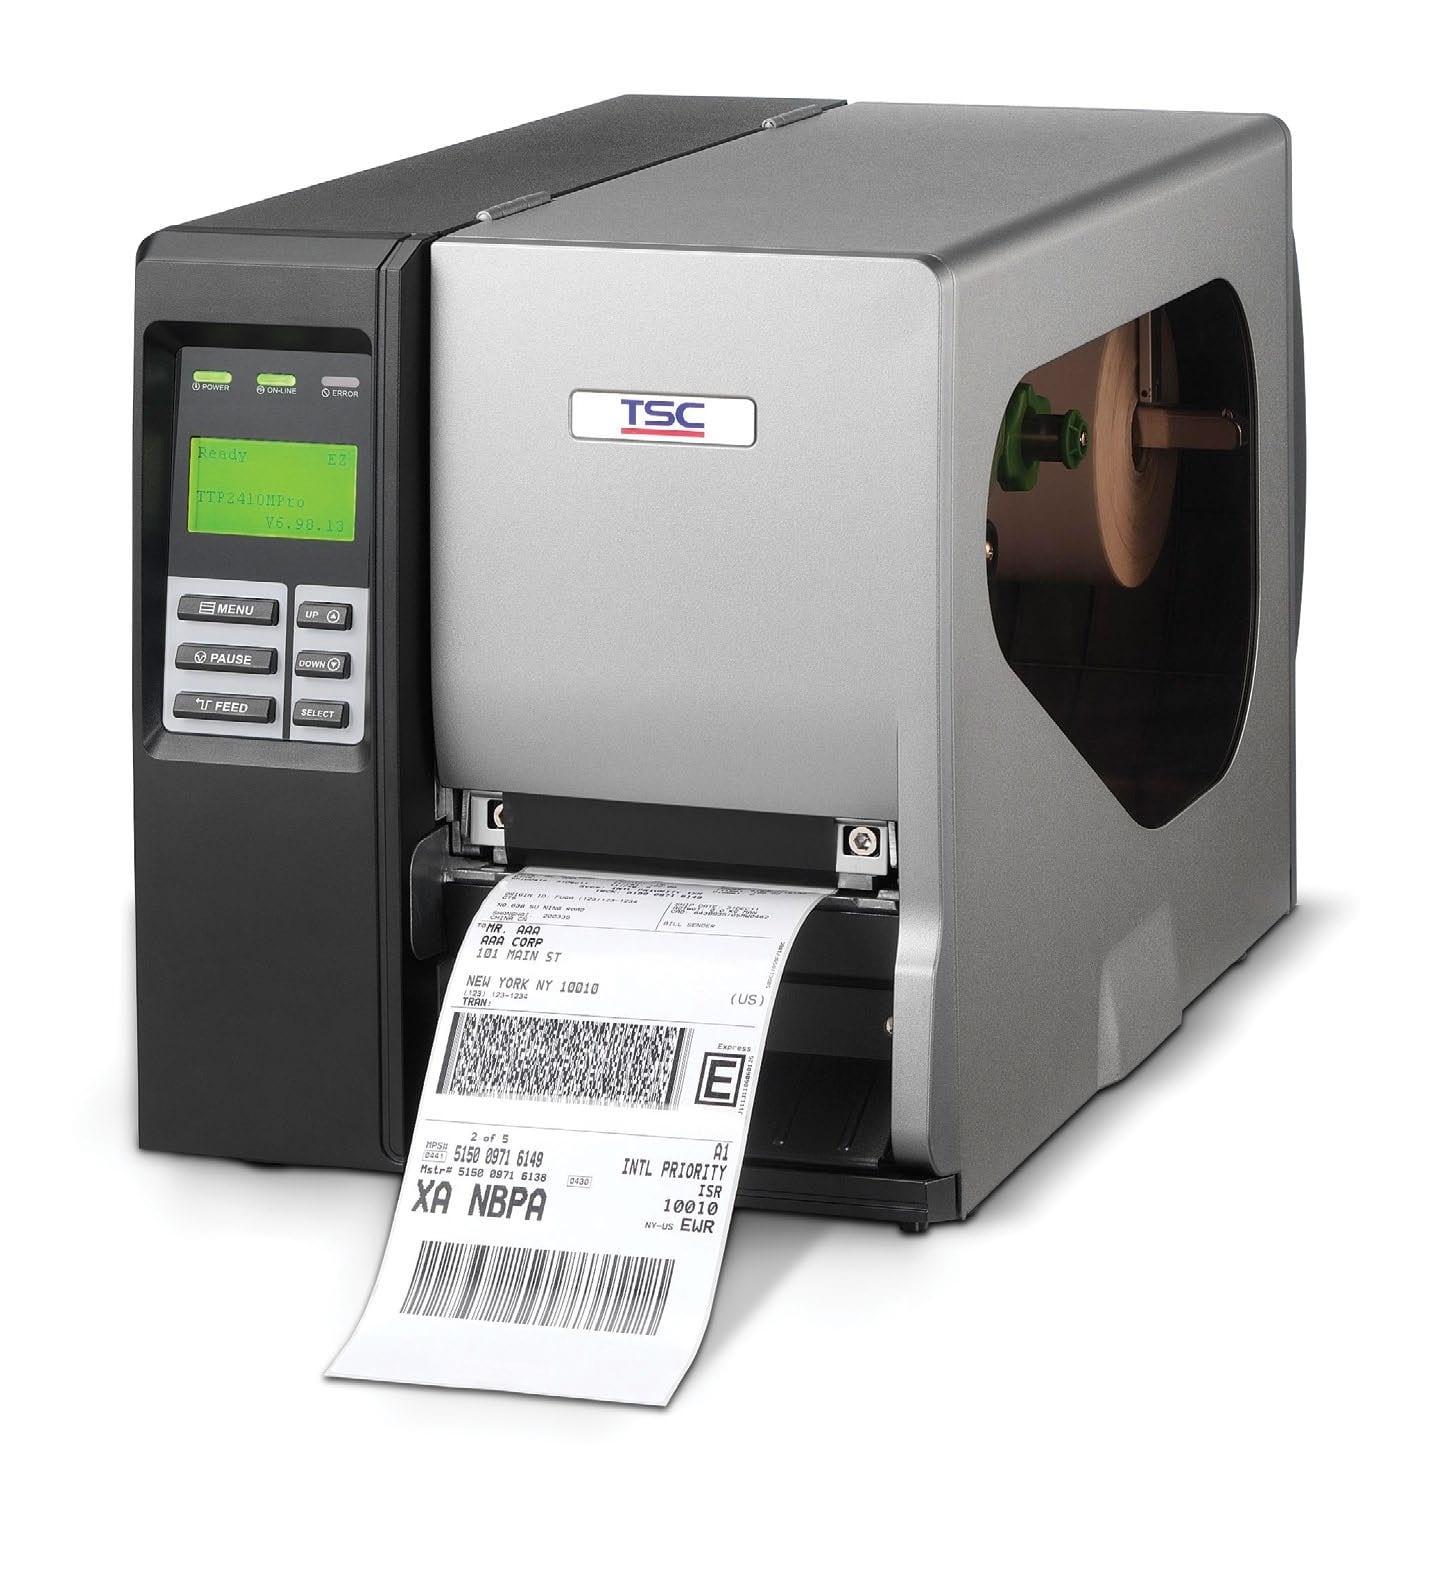 TSC TTP246M Plus Barcode Printer